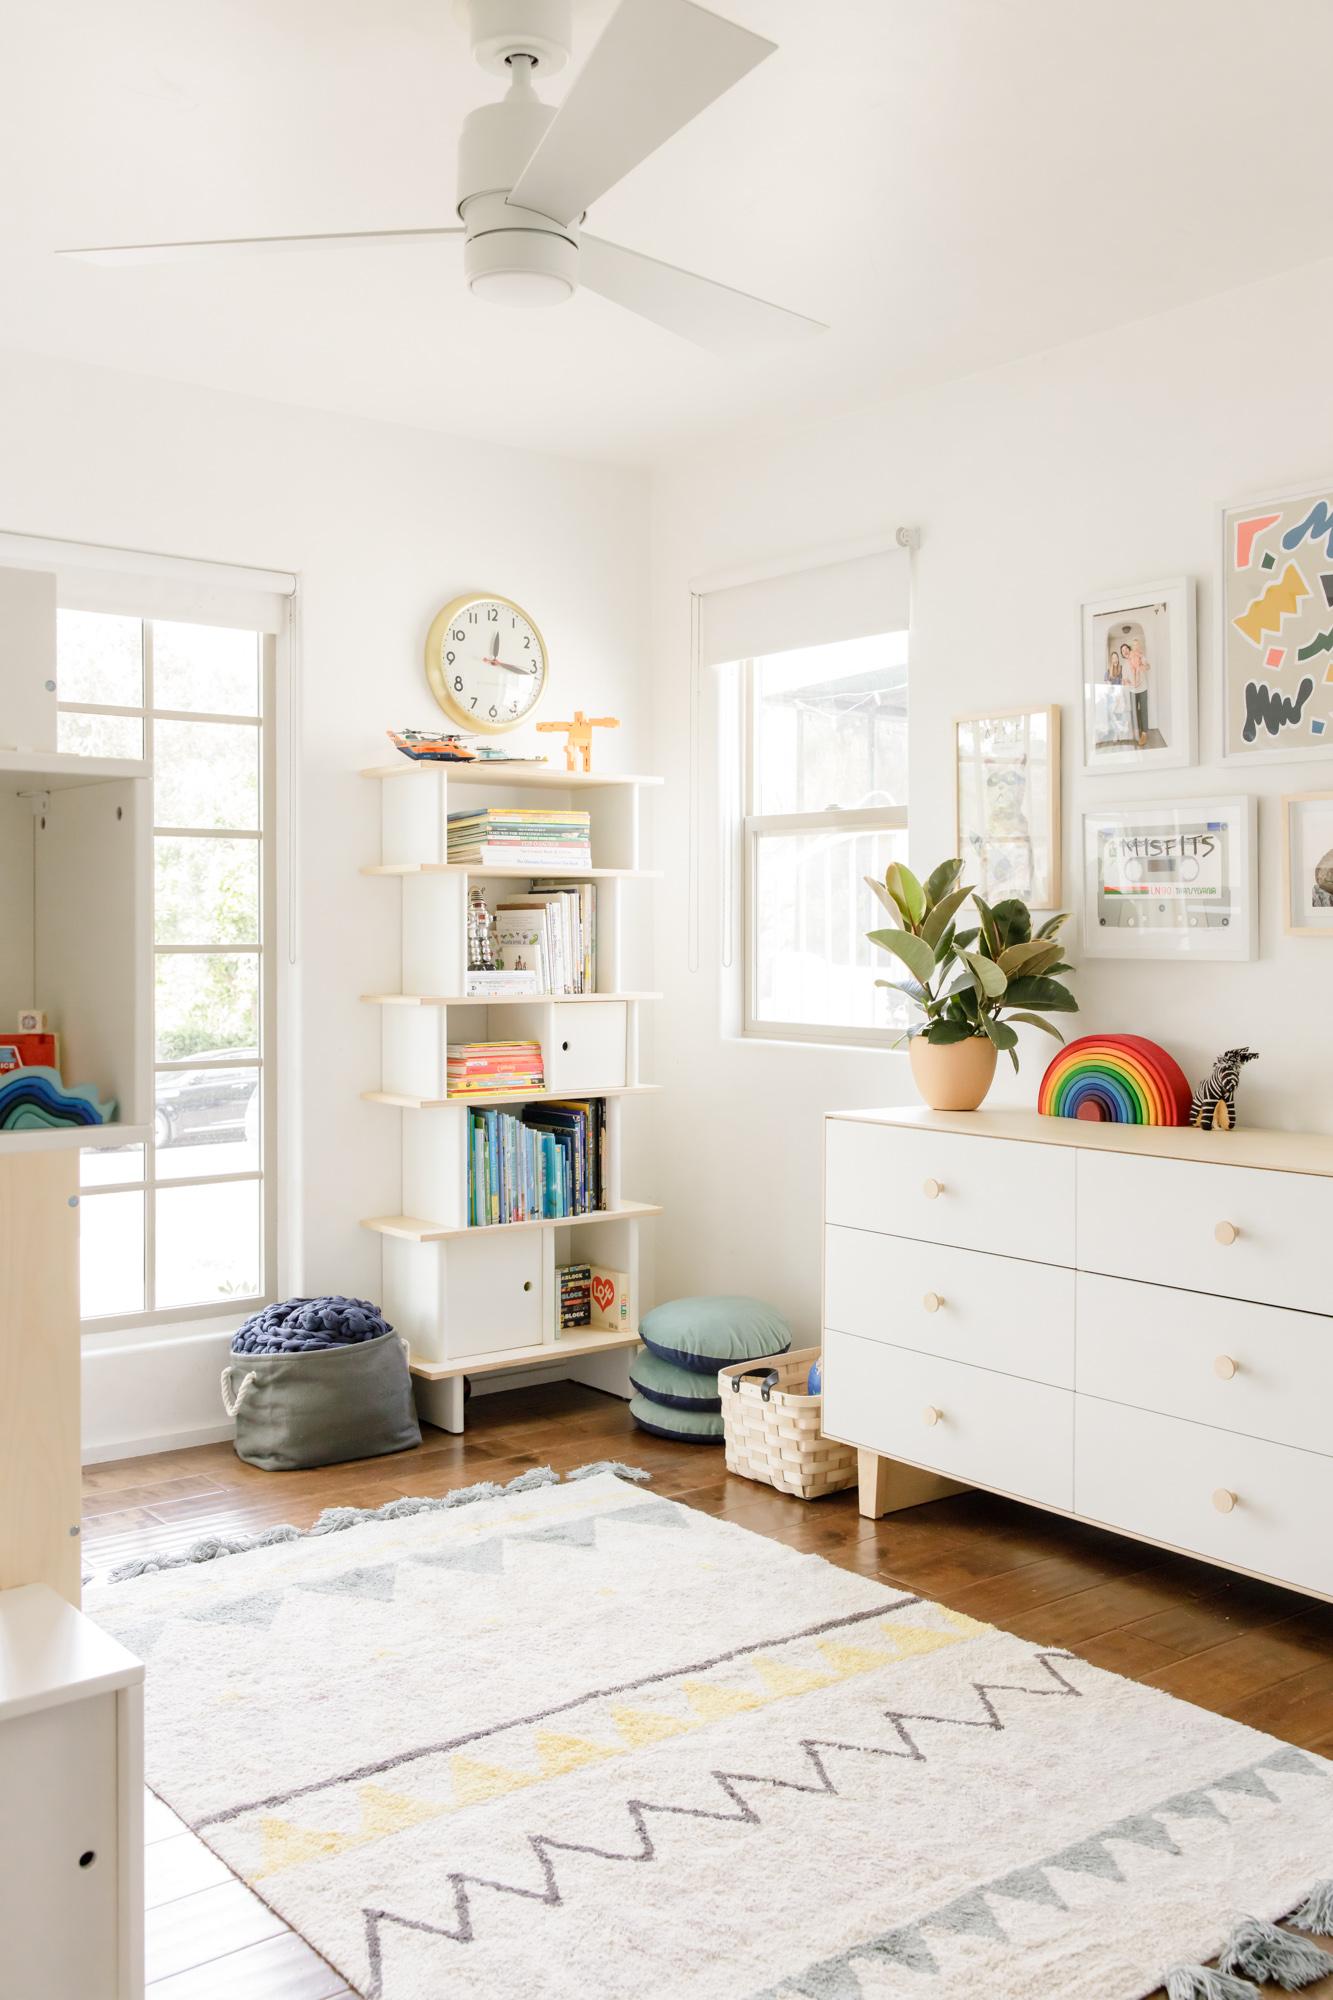 bedroom with dresser and bookshelf